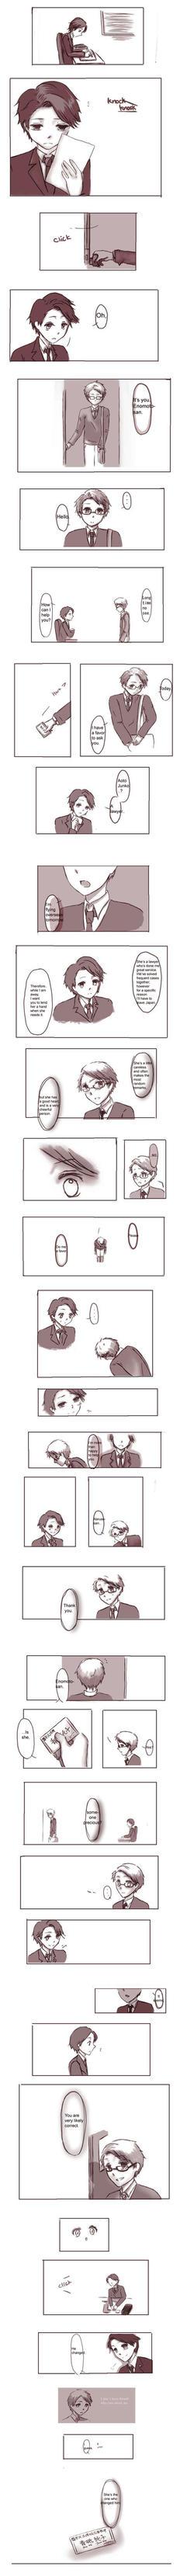 Enomoto meets Naruse by xmeltedxazukix